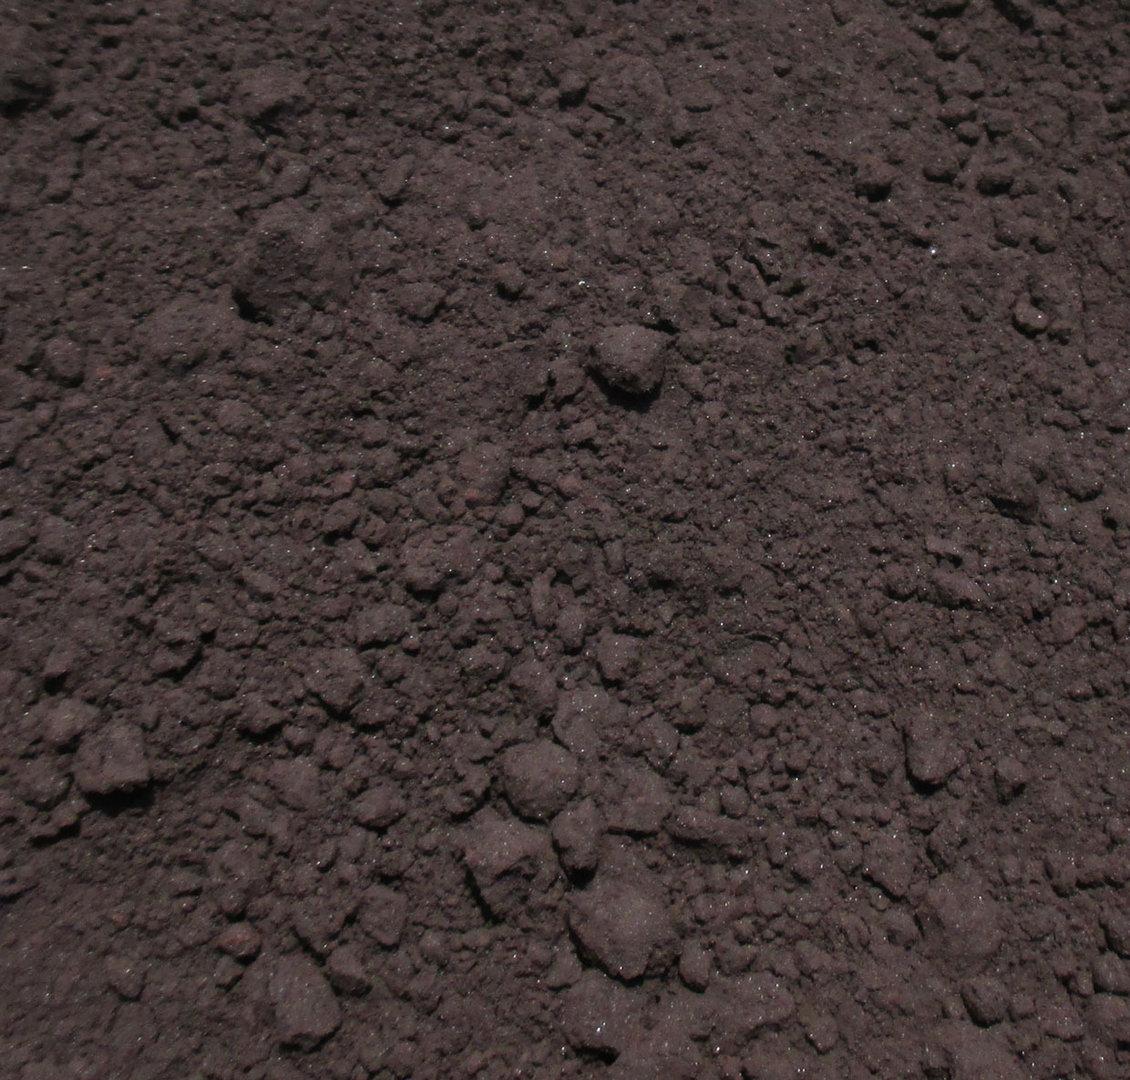 pigment morellone caput mortuum 100 g. Black Bedroom Furniture Sets. Home Design Ideas